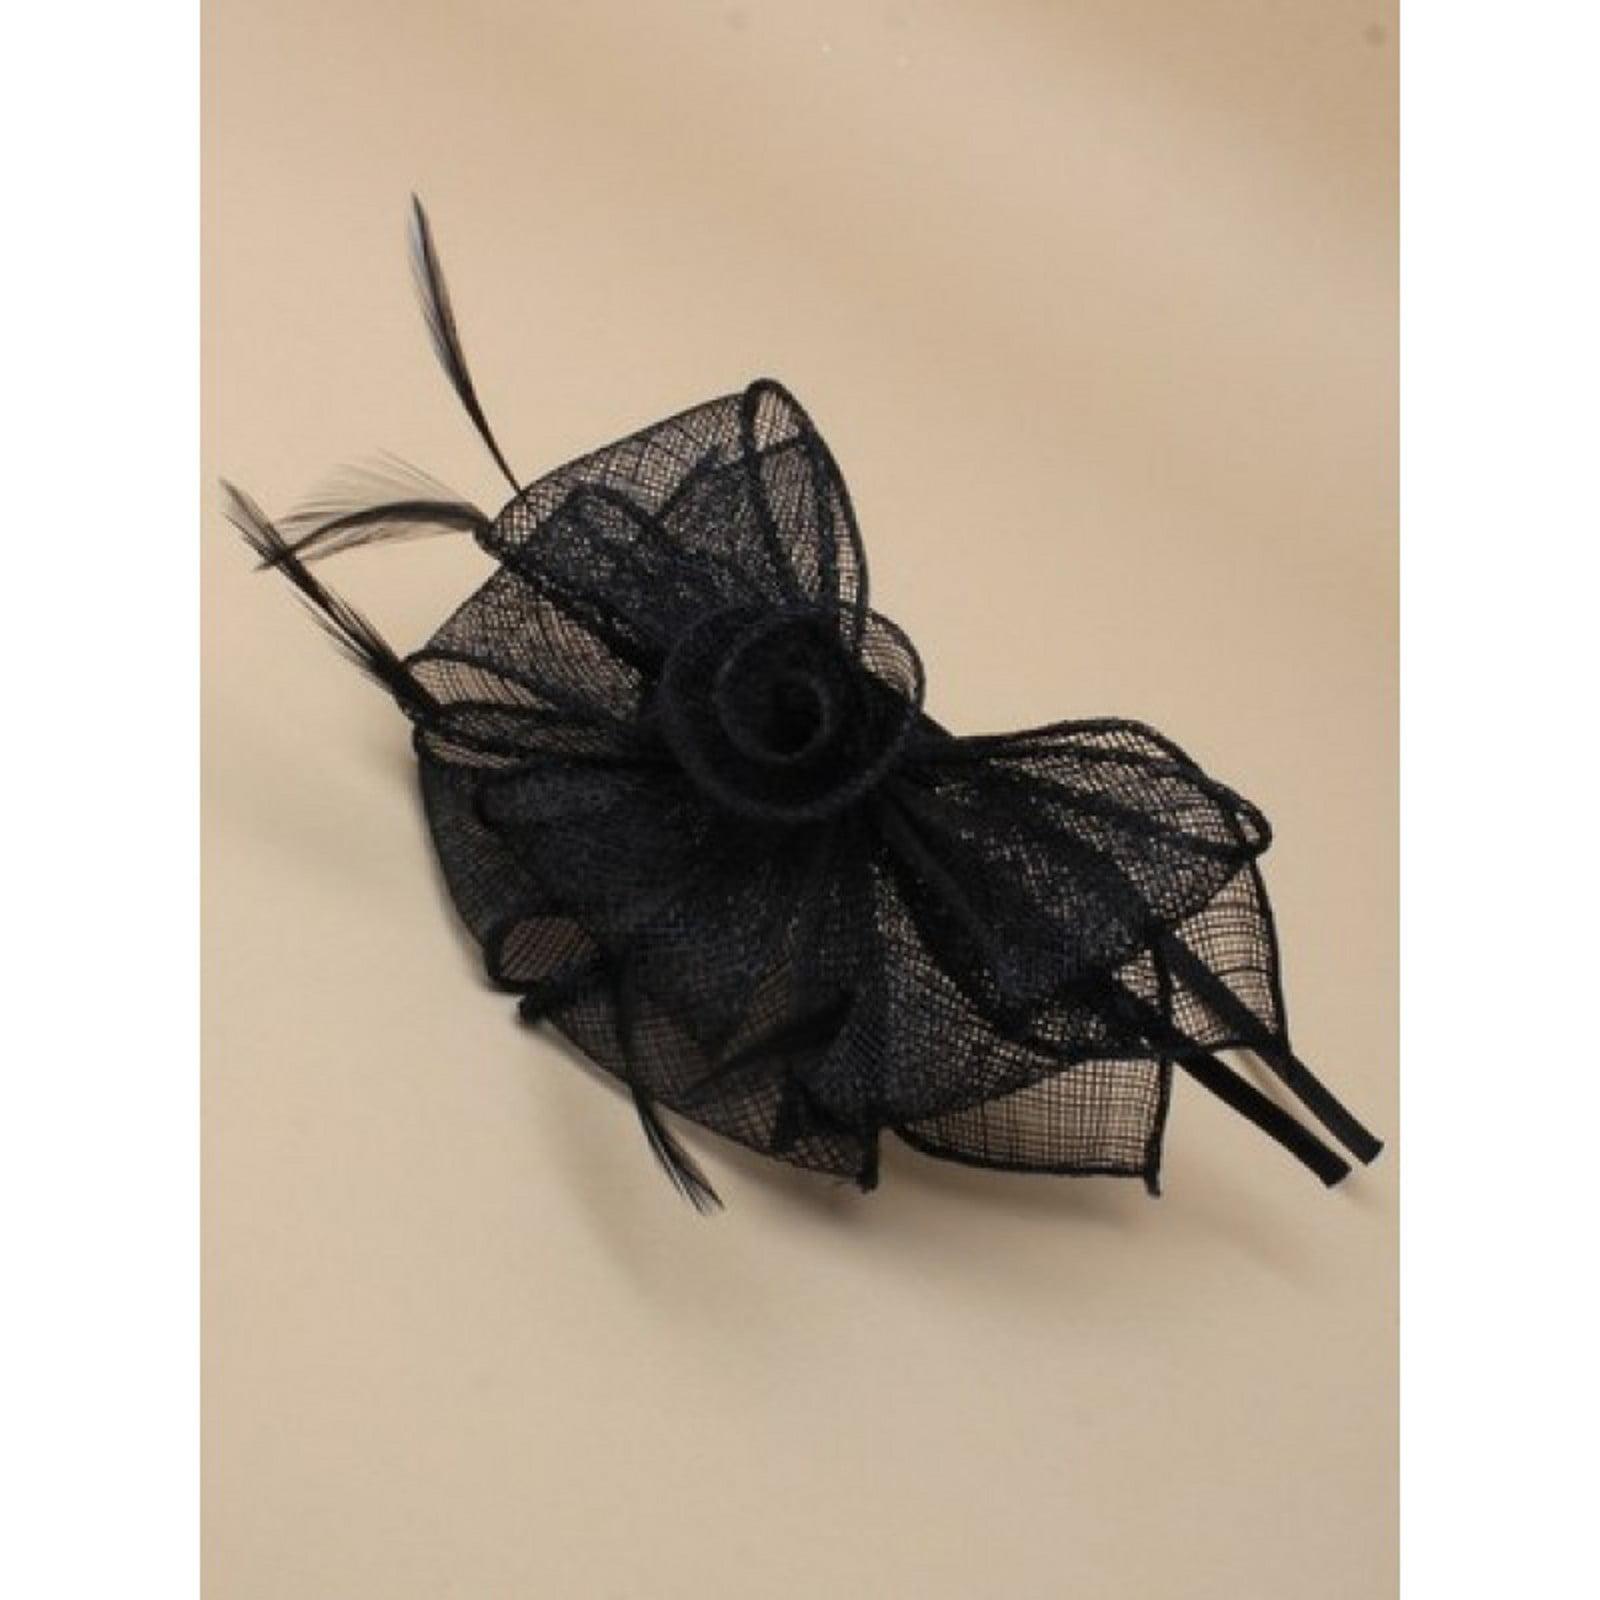 Arranview 5912-1 black fascinator